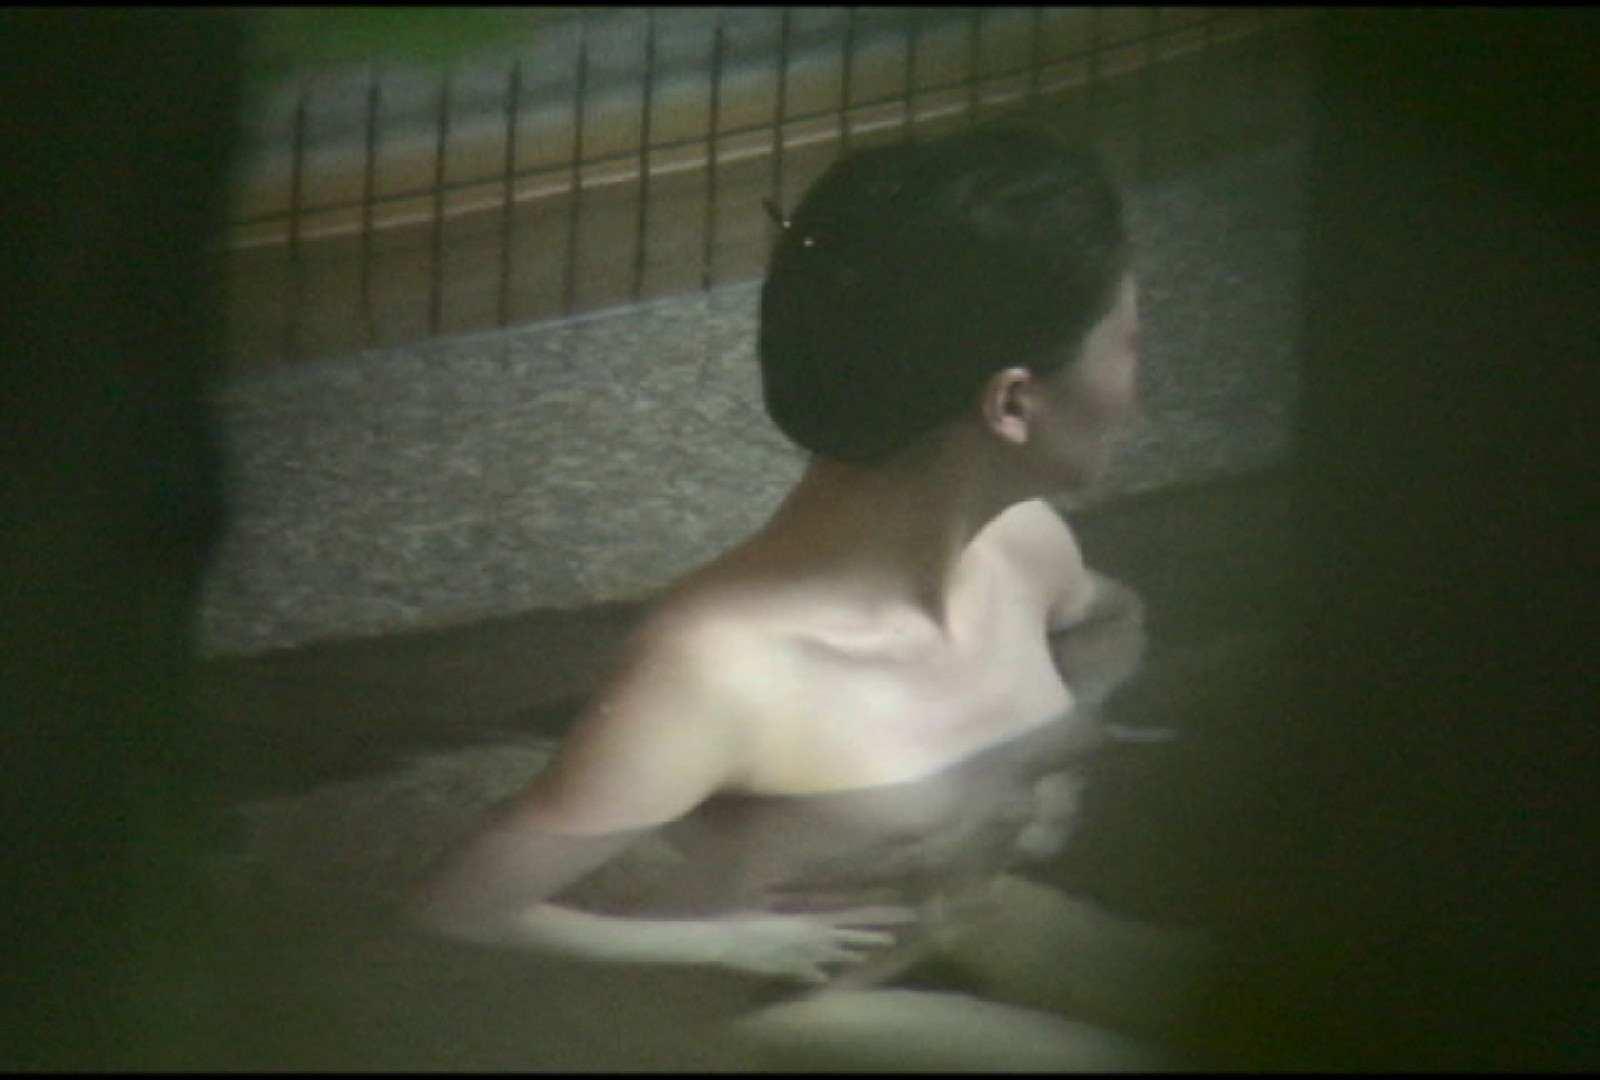 Aquaな露天風呂Vol.699 露天風呂 | OLのエロ生活  104連発 37